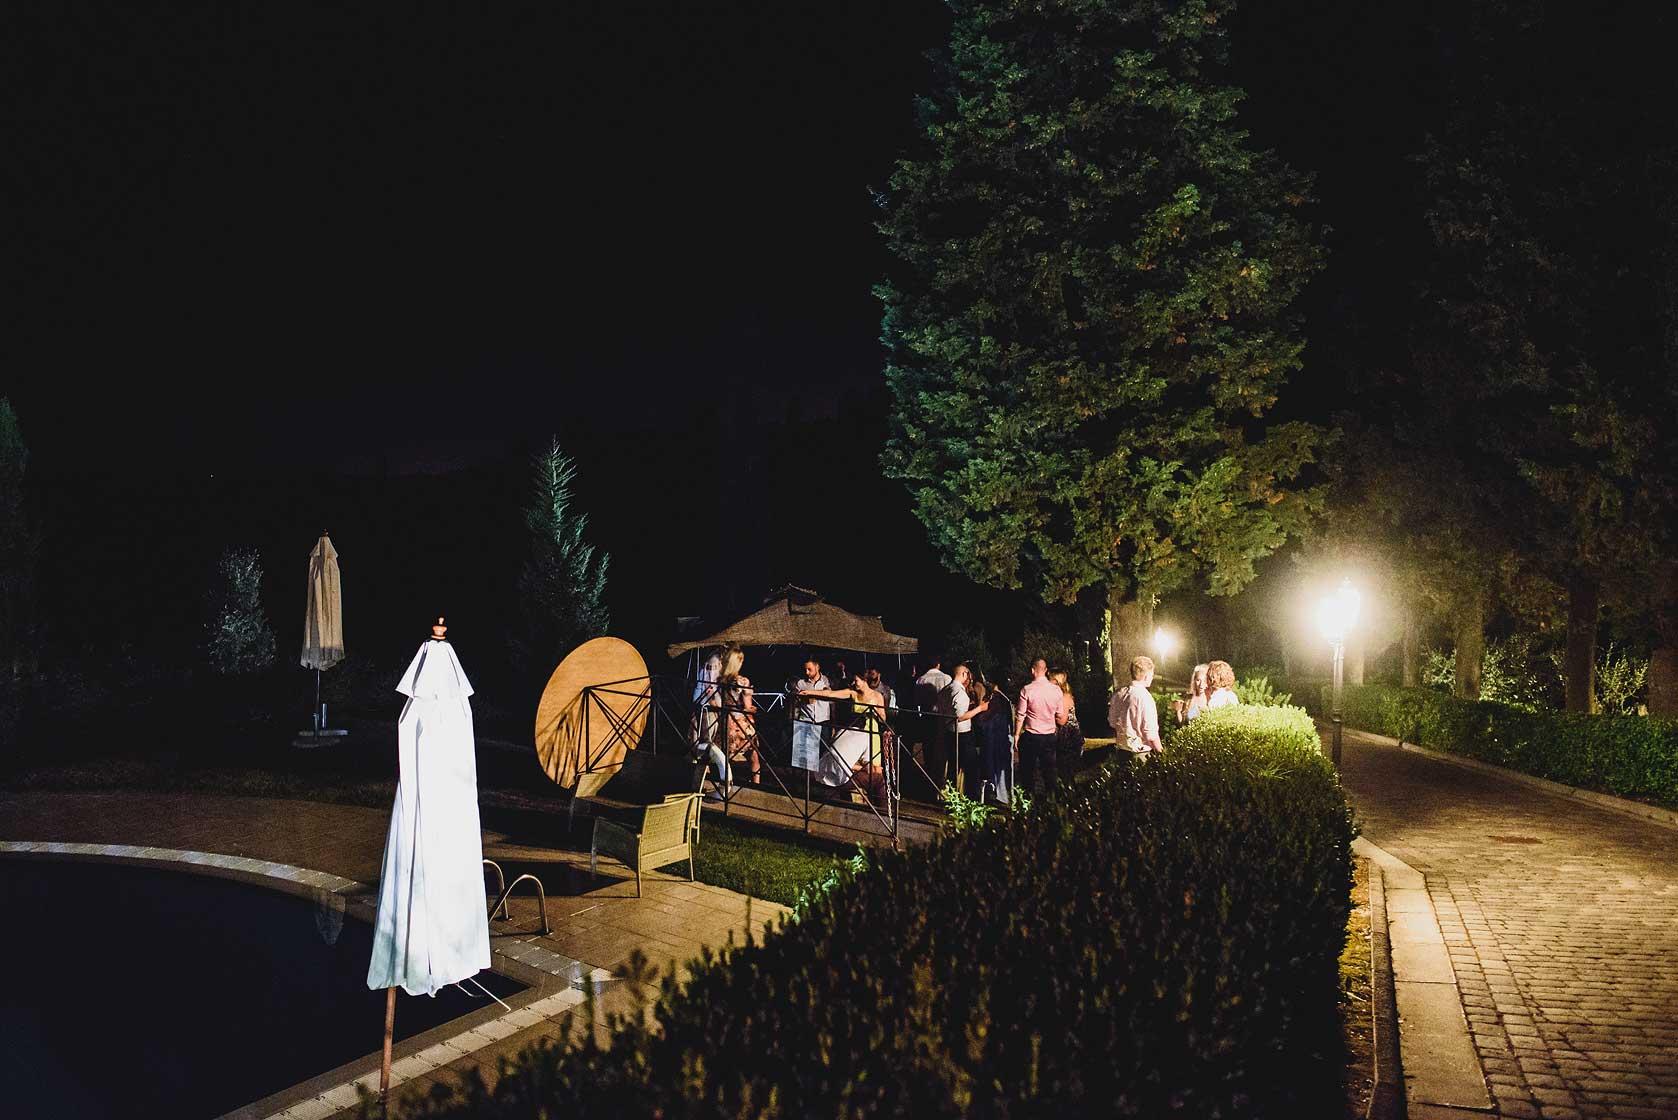 Destination wedding at Borgo Bucciano